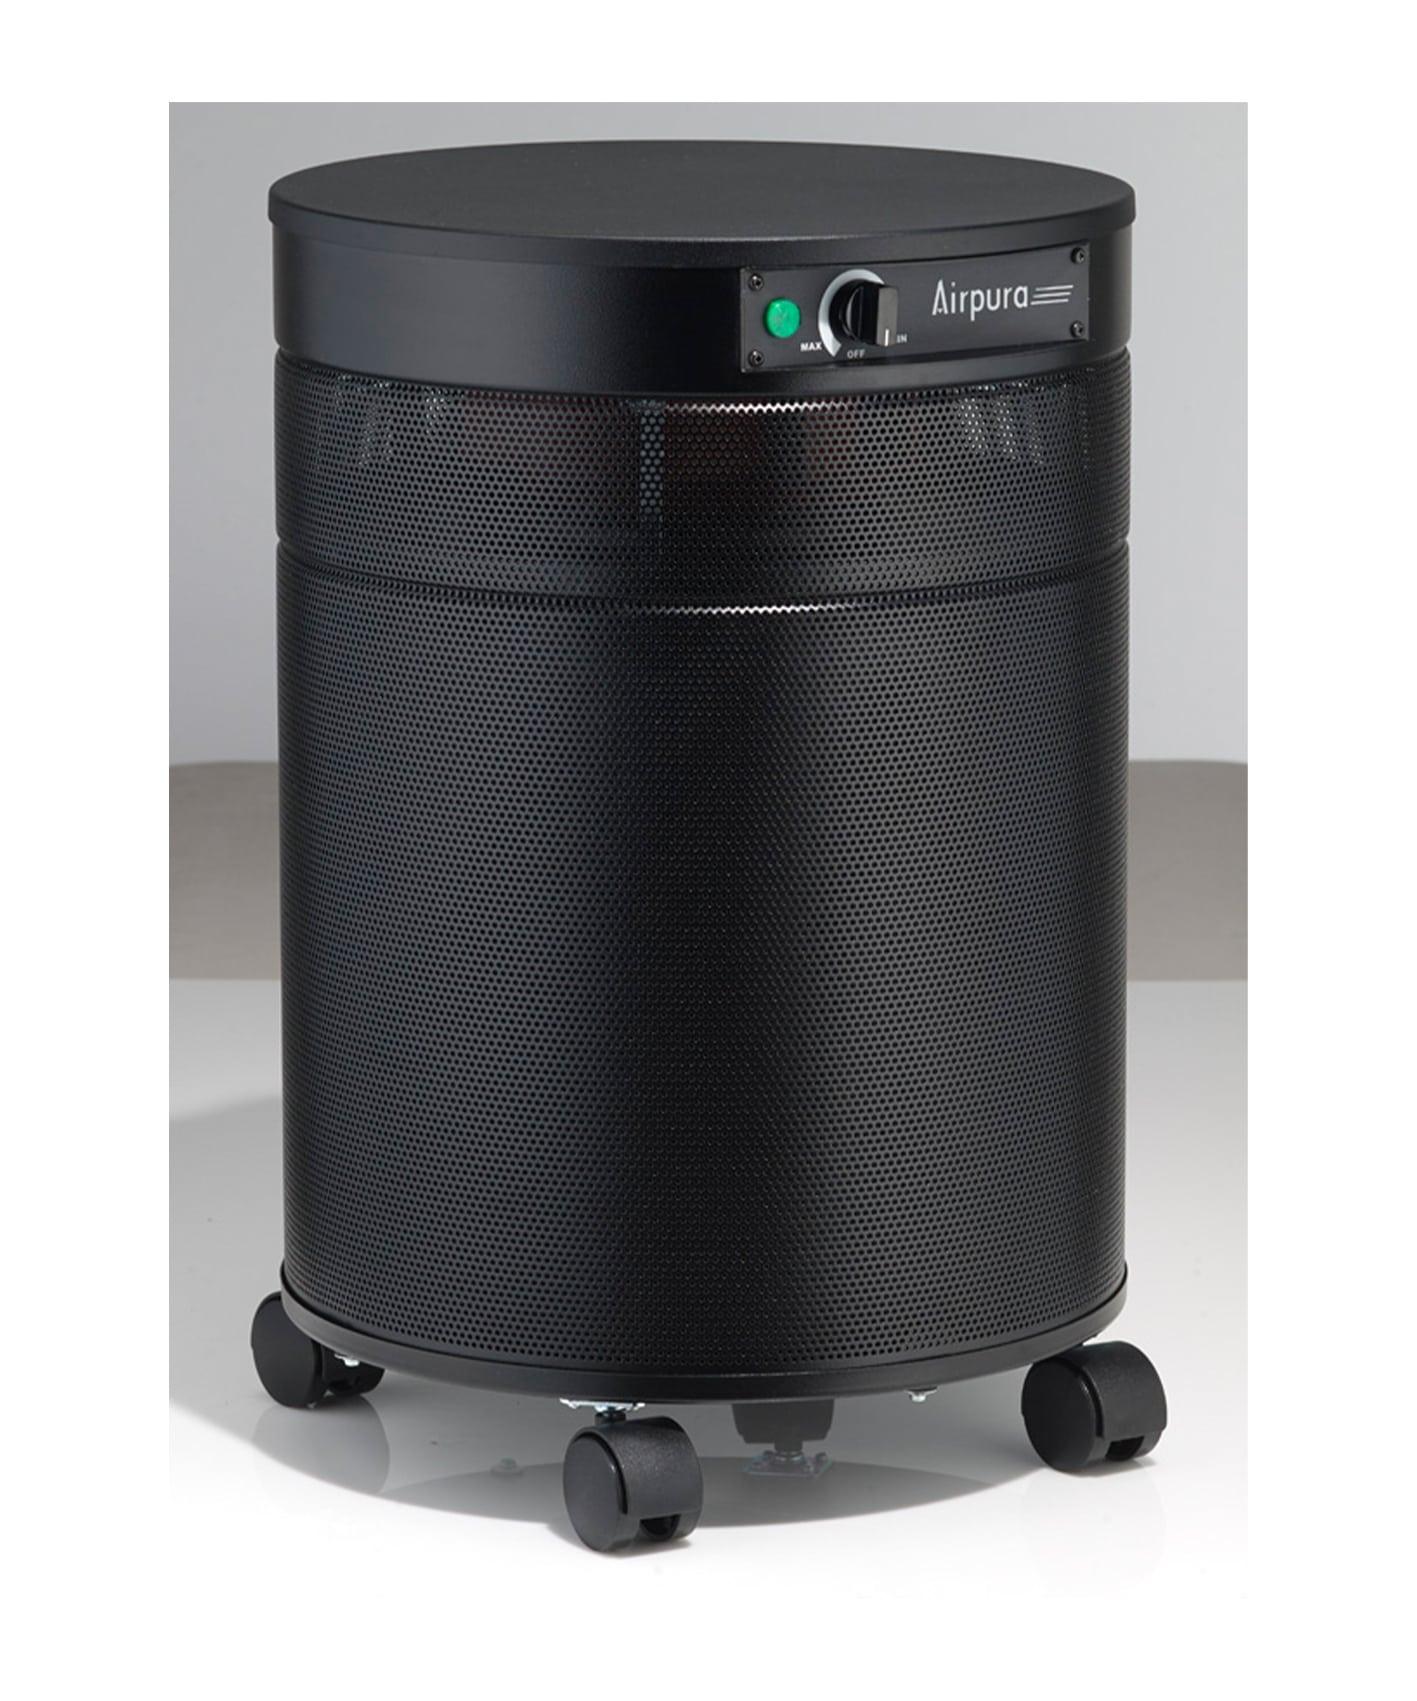 Airpura Luftrenser, Filtre mod aerosoler, Corona